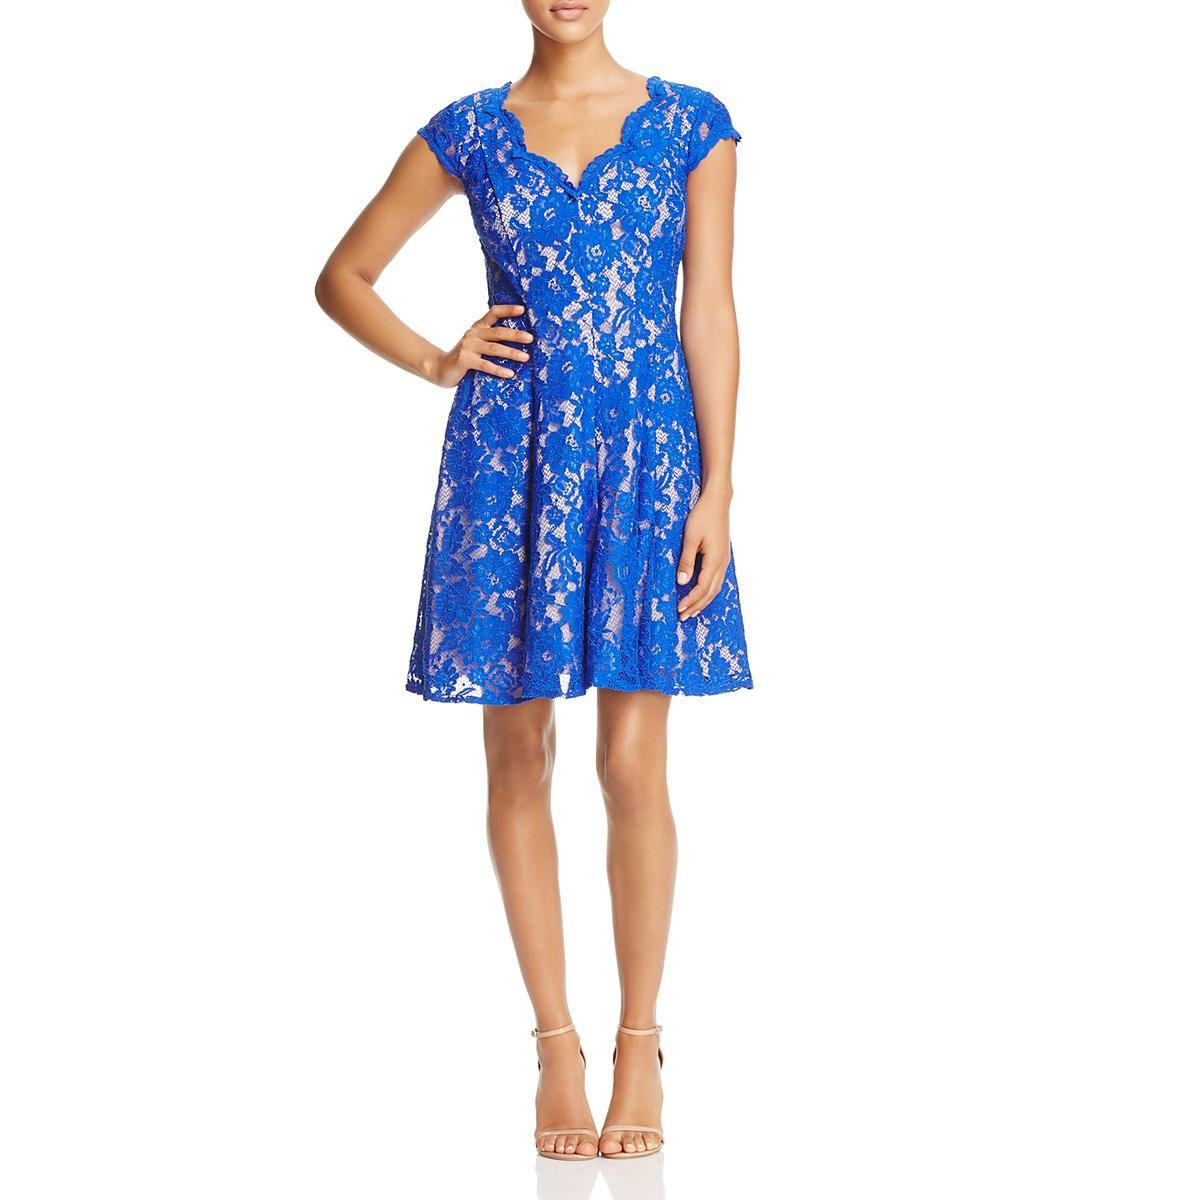 b4d64d0bd879d8 Lyst - Eliza J Womens V-neck Fit   Flare Casual Dress in Blue